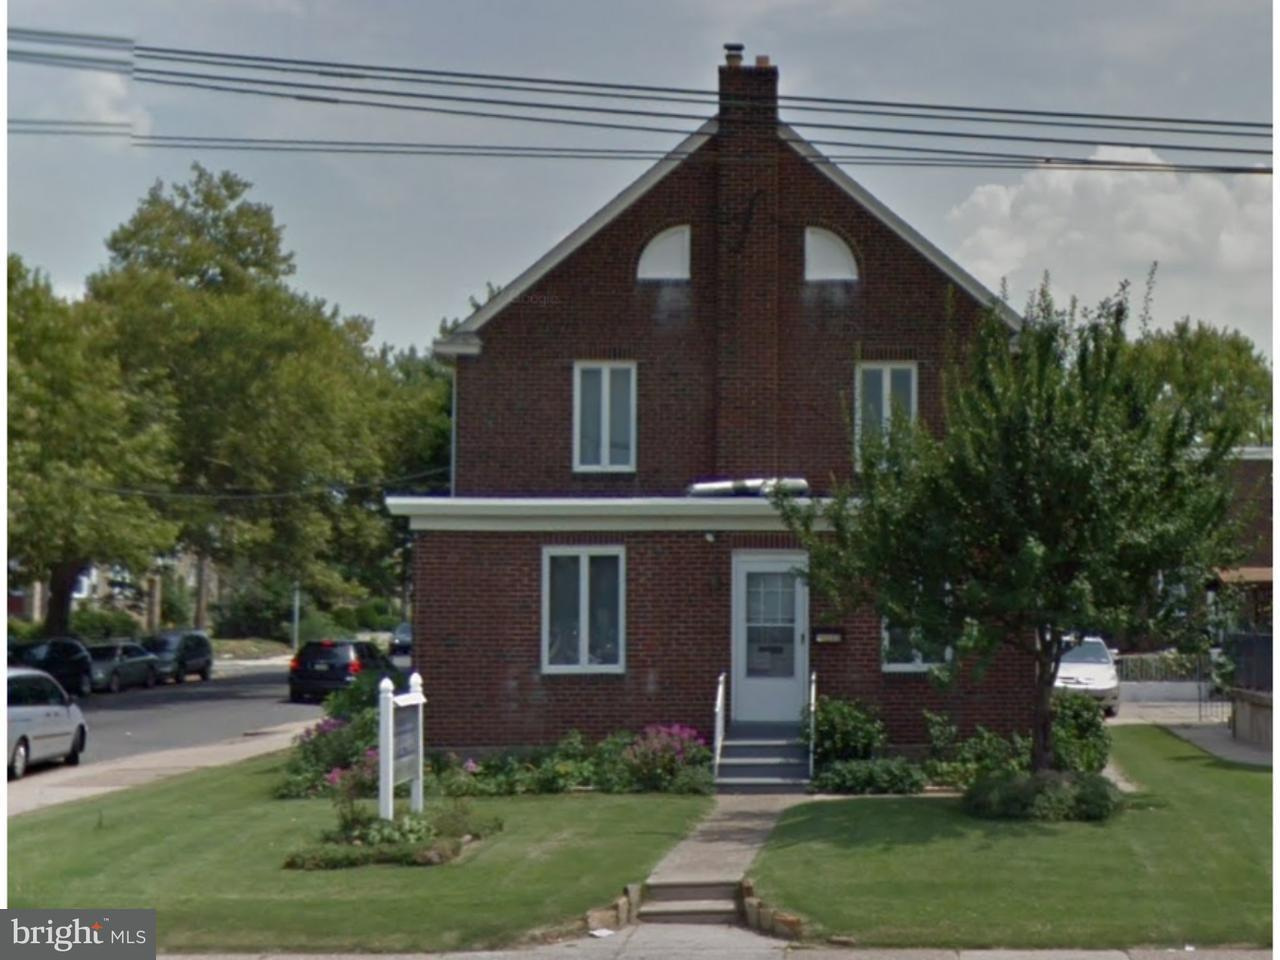 6833  Castor Philadelphia, PA 19149